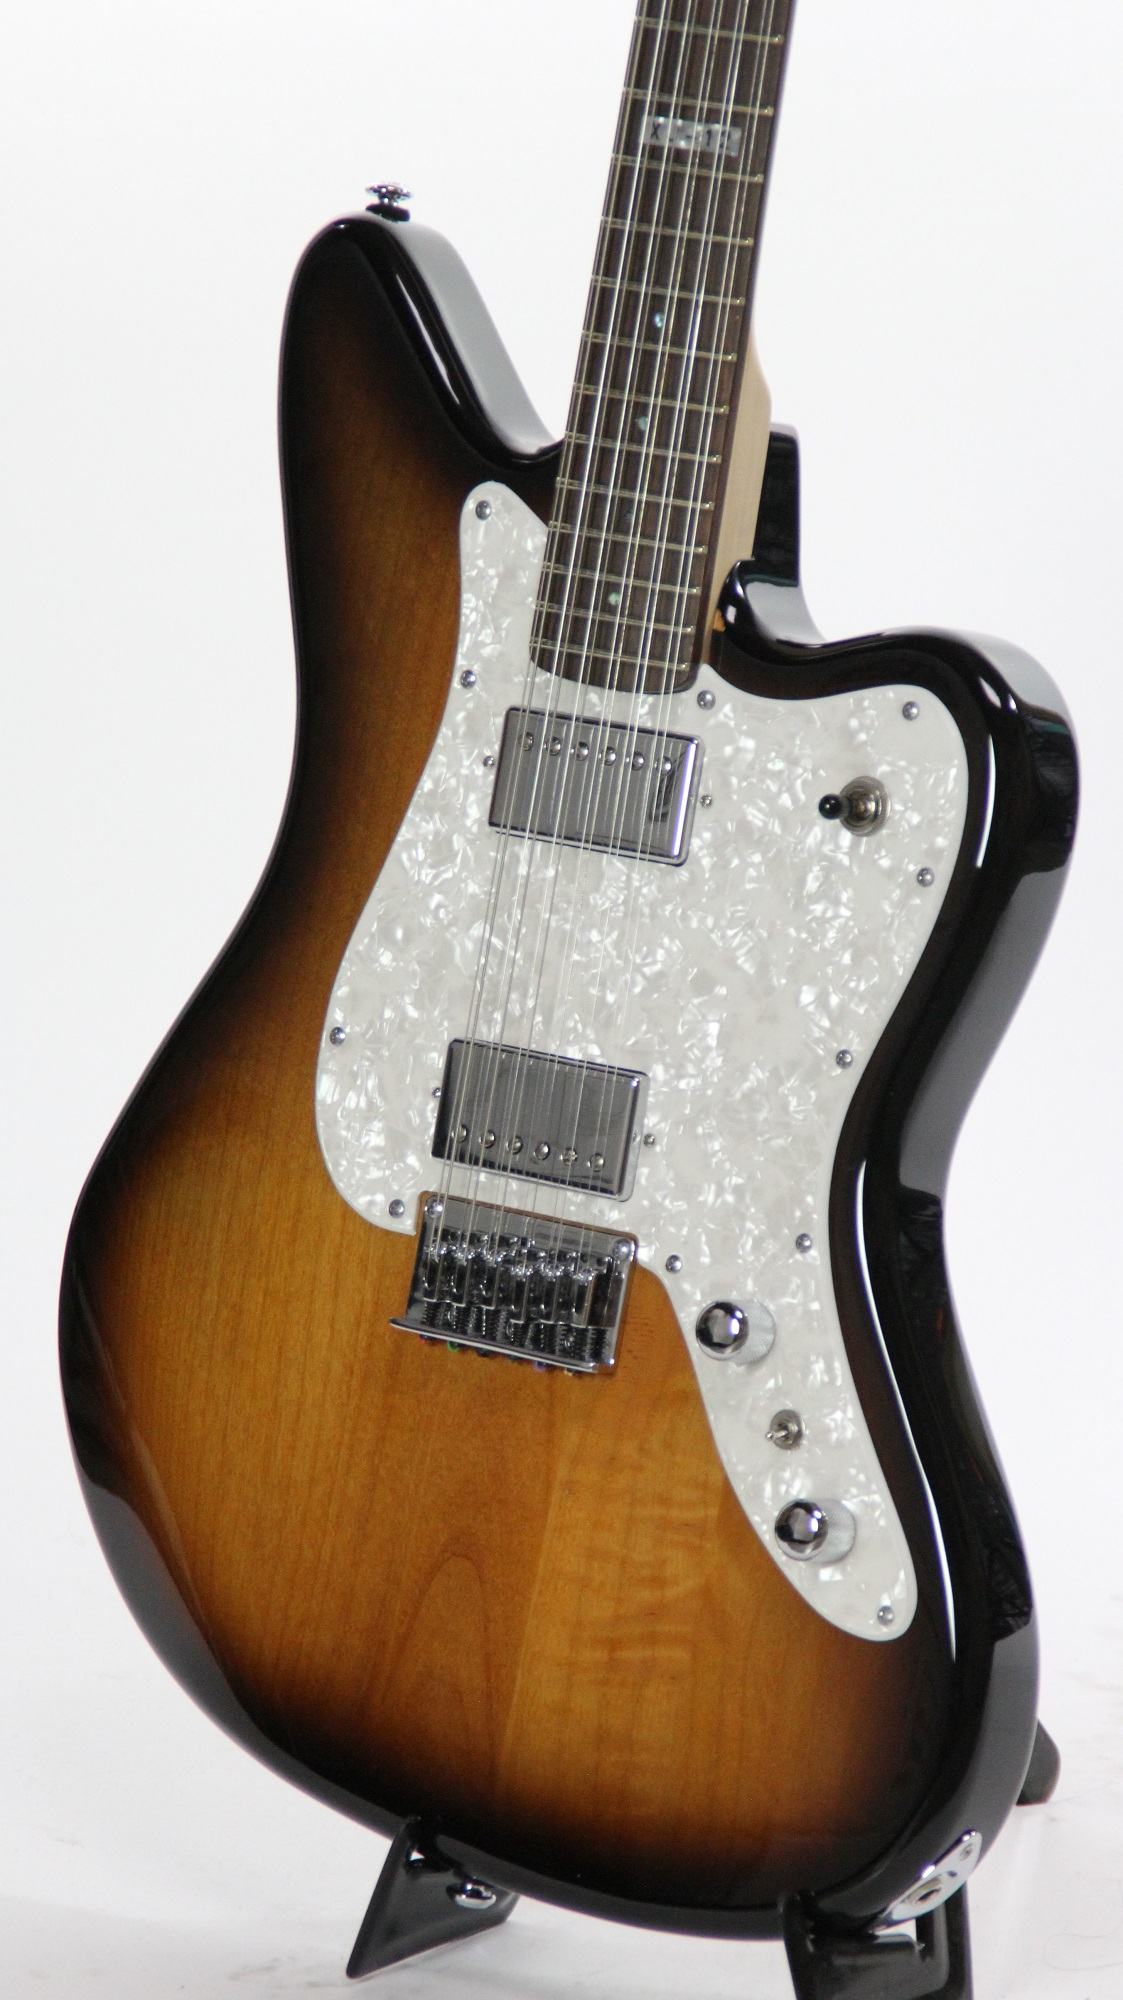 esp ltd xj 12 2tb 2 tone burst sample prototype electric guitar 6. Black Bedroom Furniture Sets. Home Design Ideas